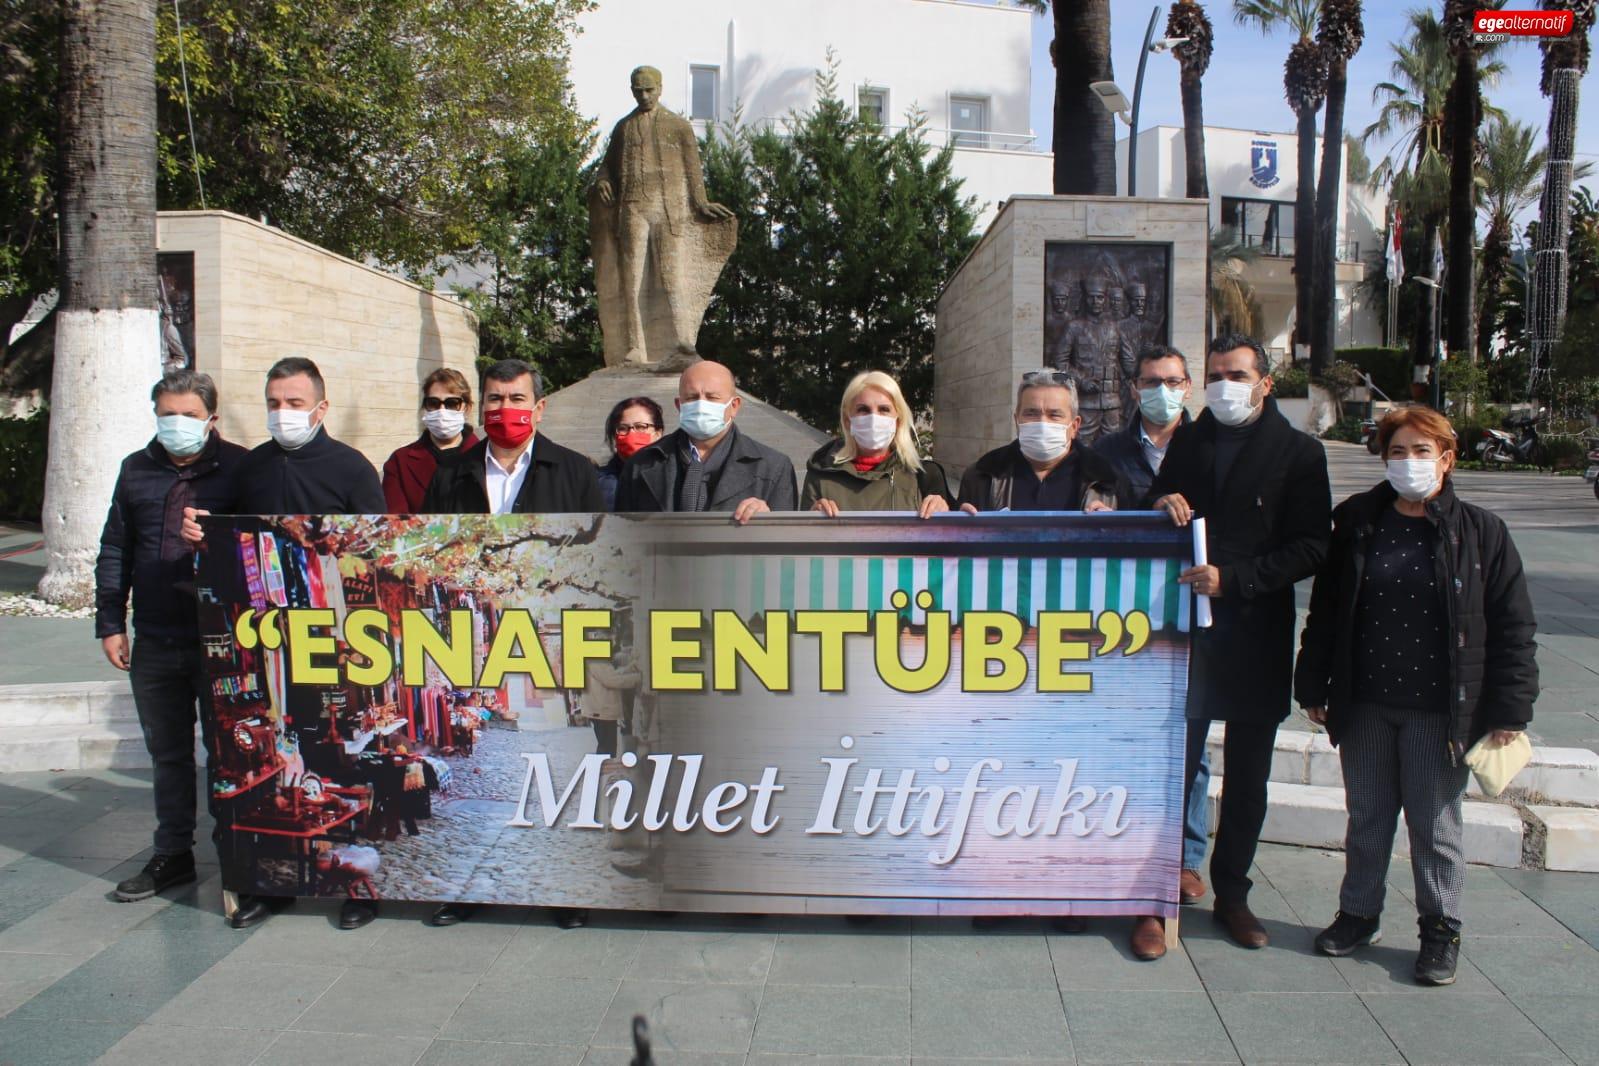 Millet İttifakı: Bodrum'da Esnaf Entübe durumunda